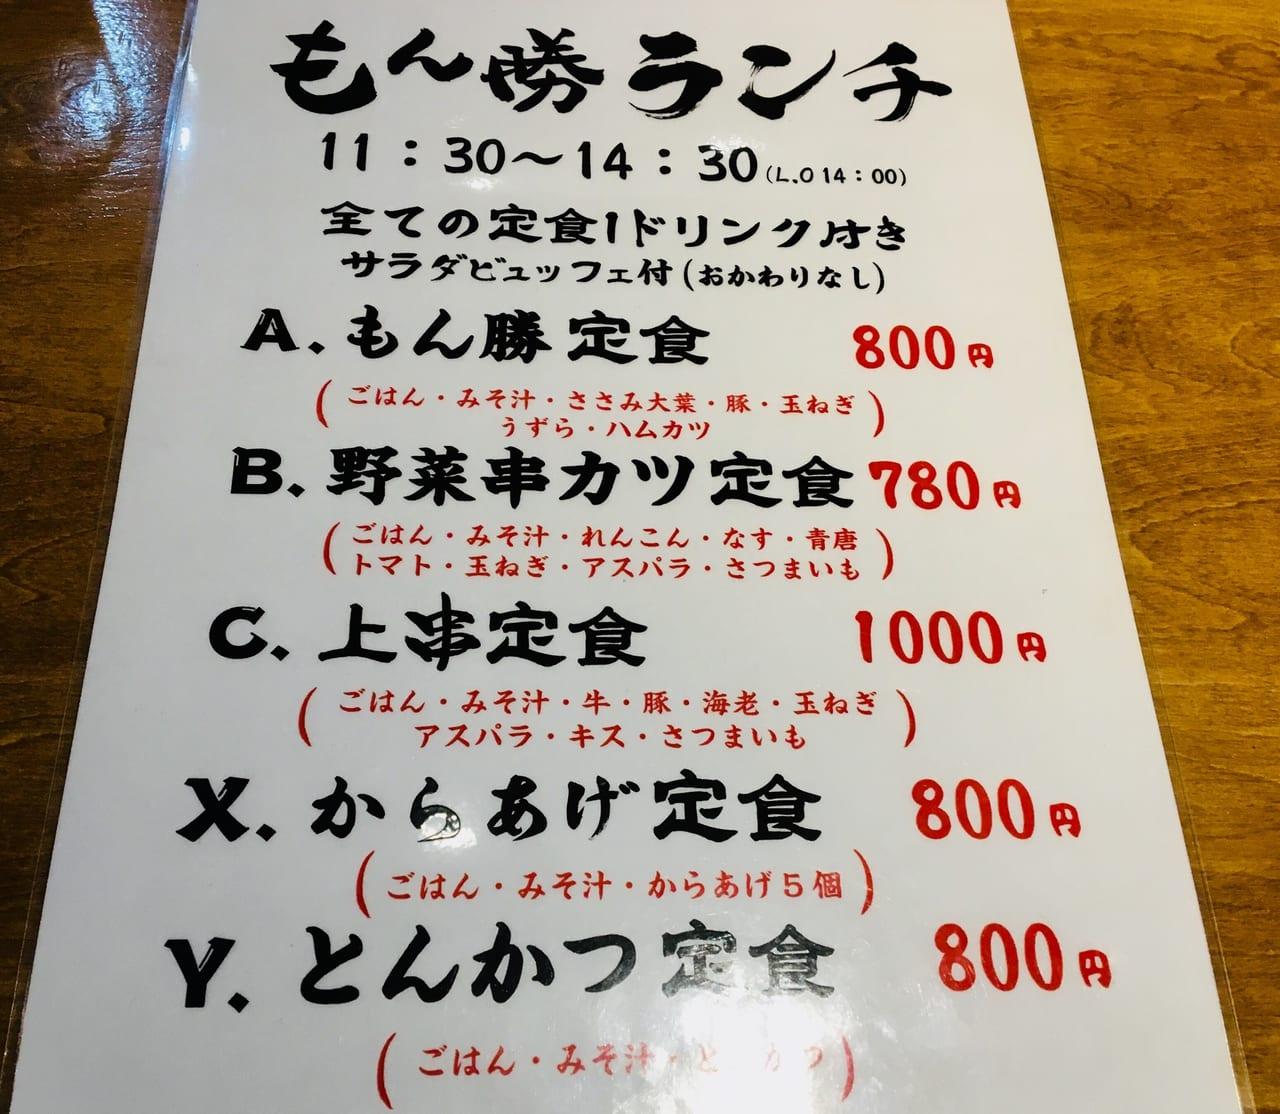 monkatsu lunch